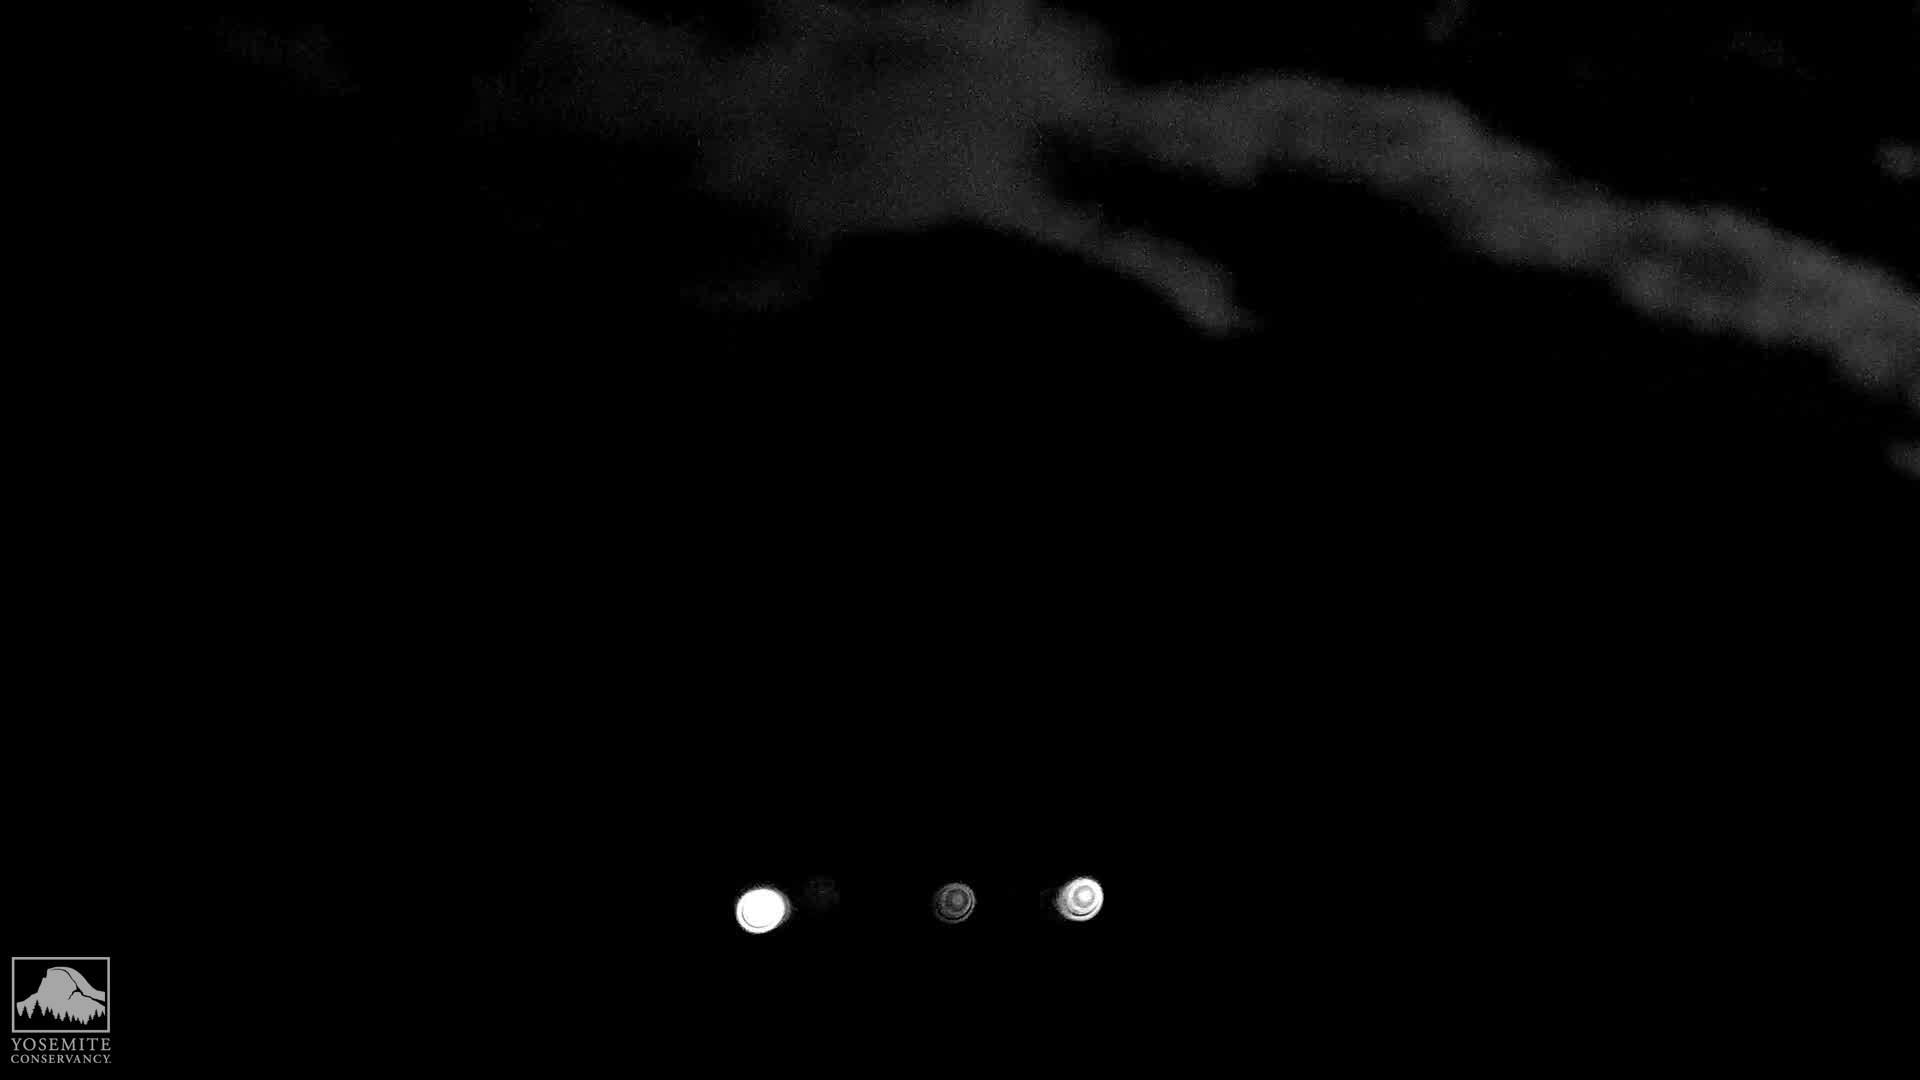 Yosemite-Nationalpark, Kalifornien Sa. 23:45